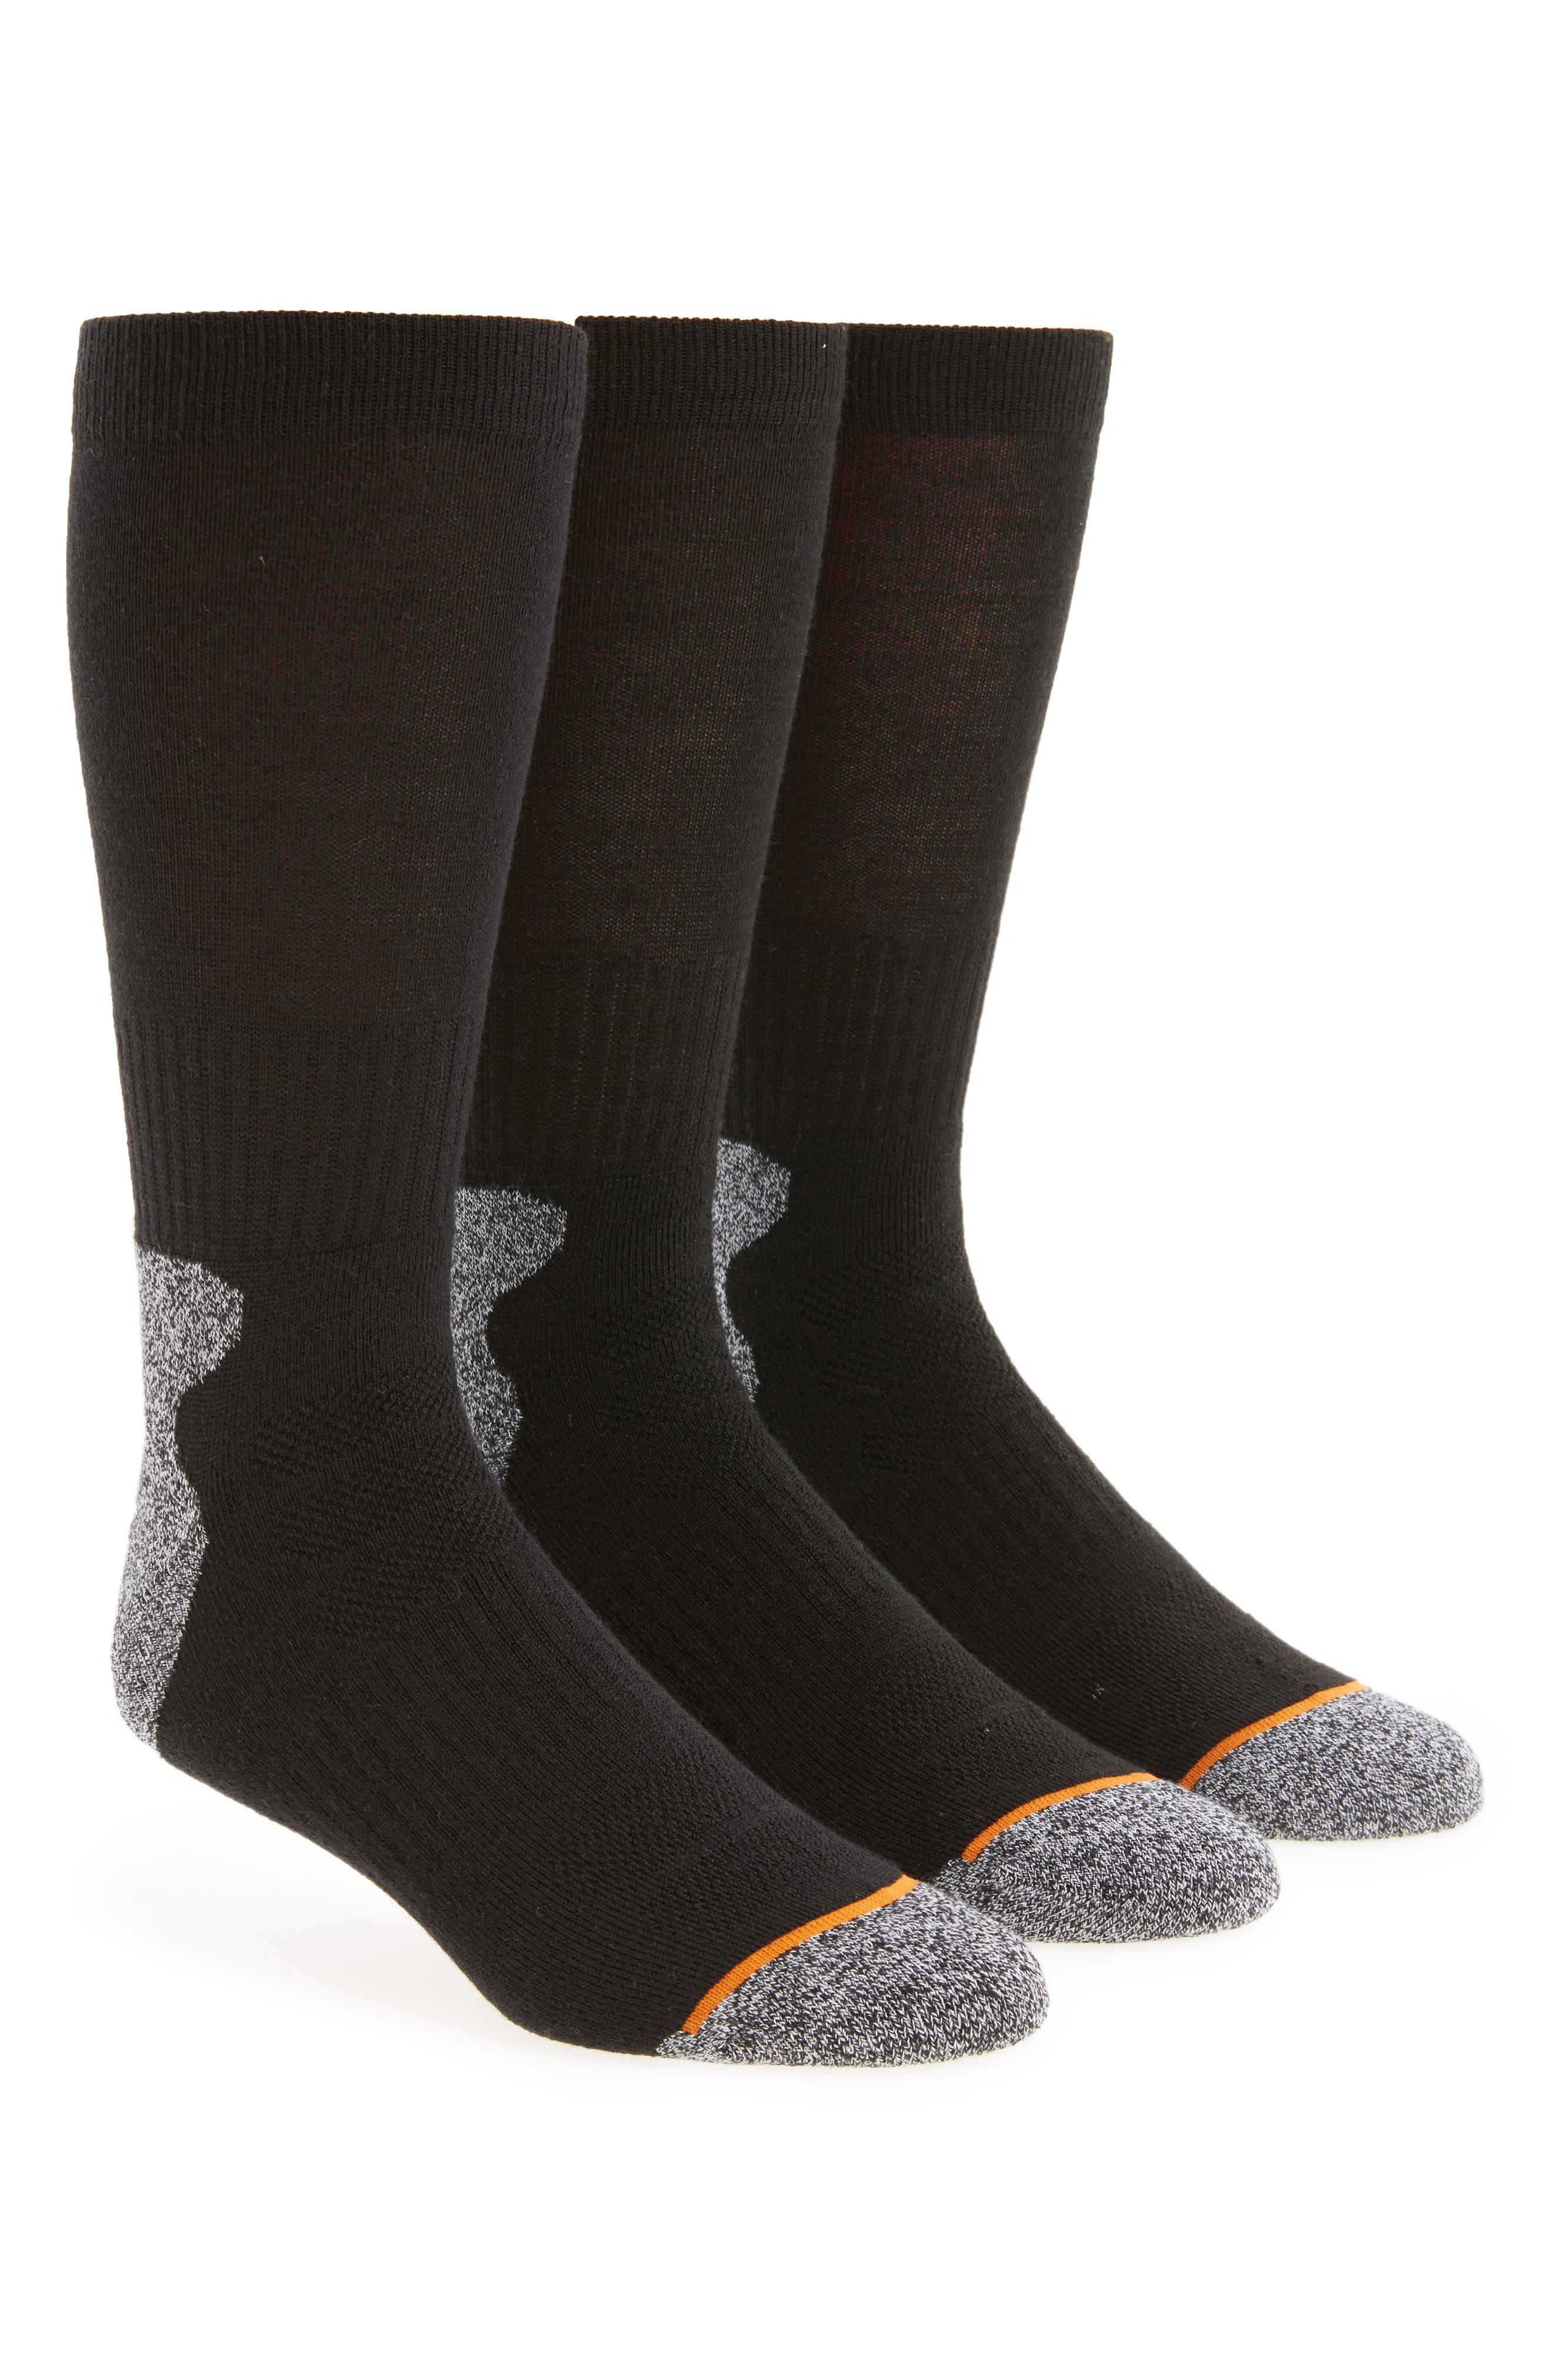 3-Pack Assorted Boot Socks,                             Main thumbnail 1, color,                             001